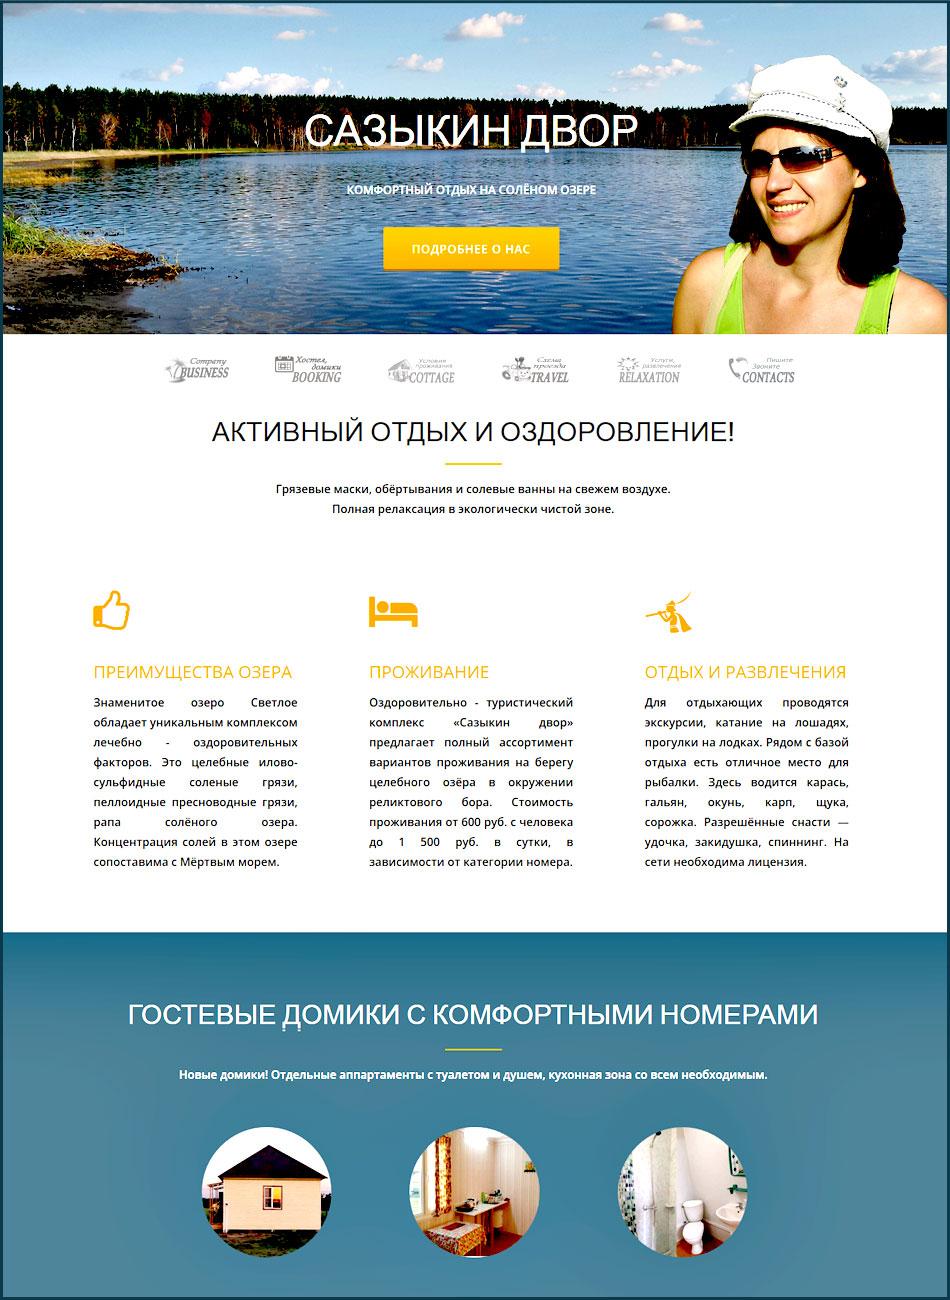 sazikin-dvor-glavnaya